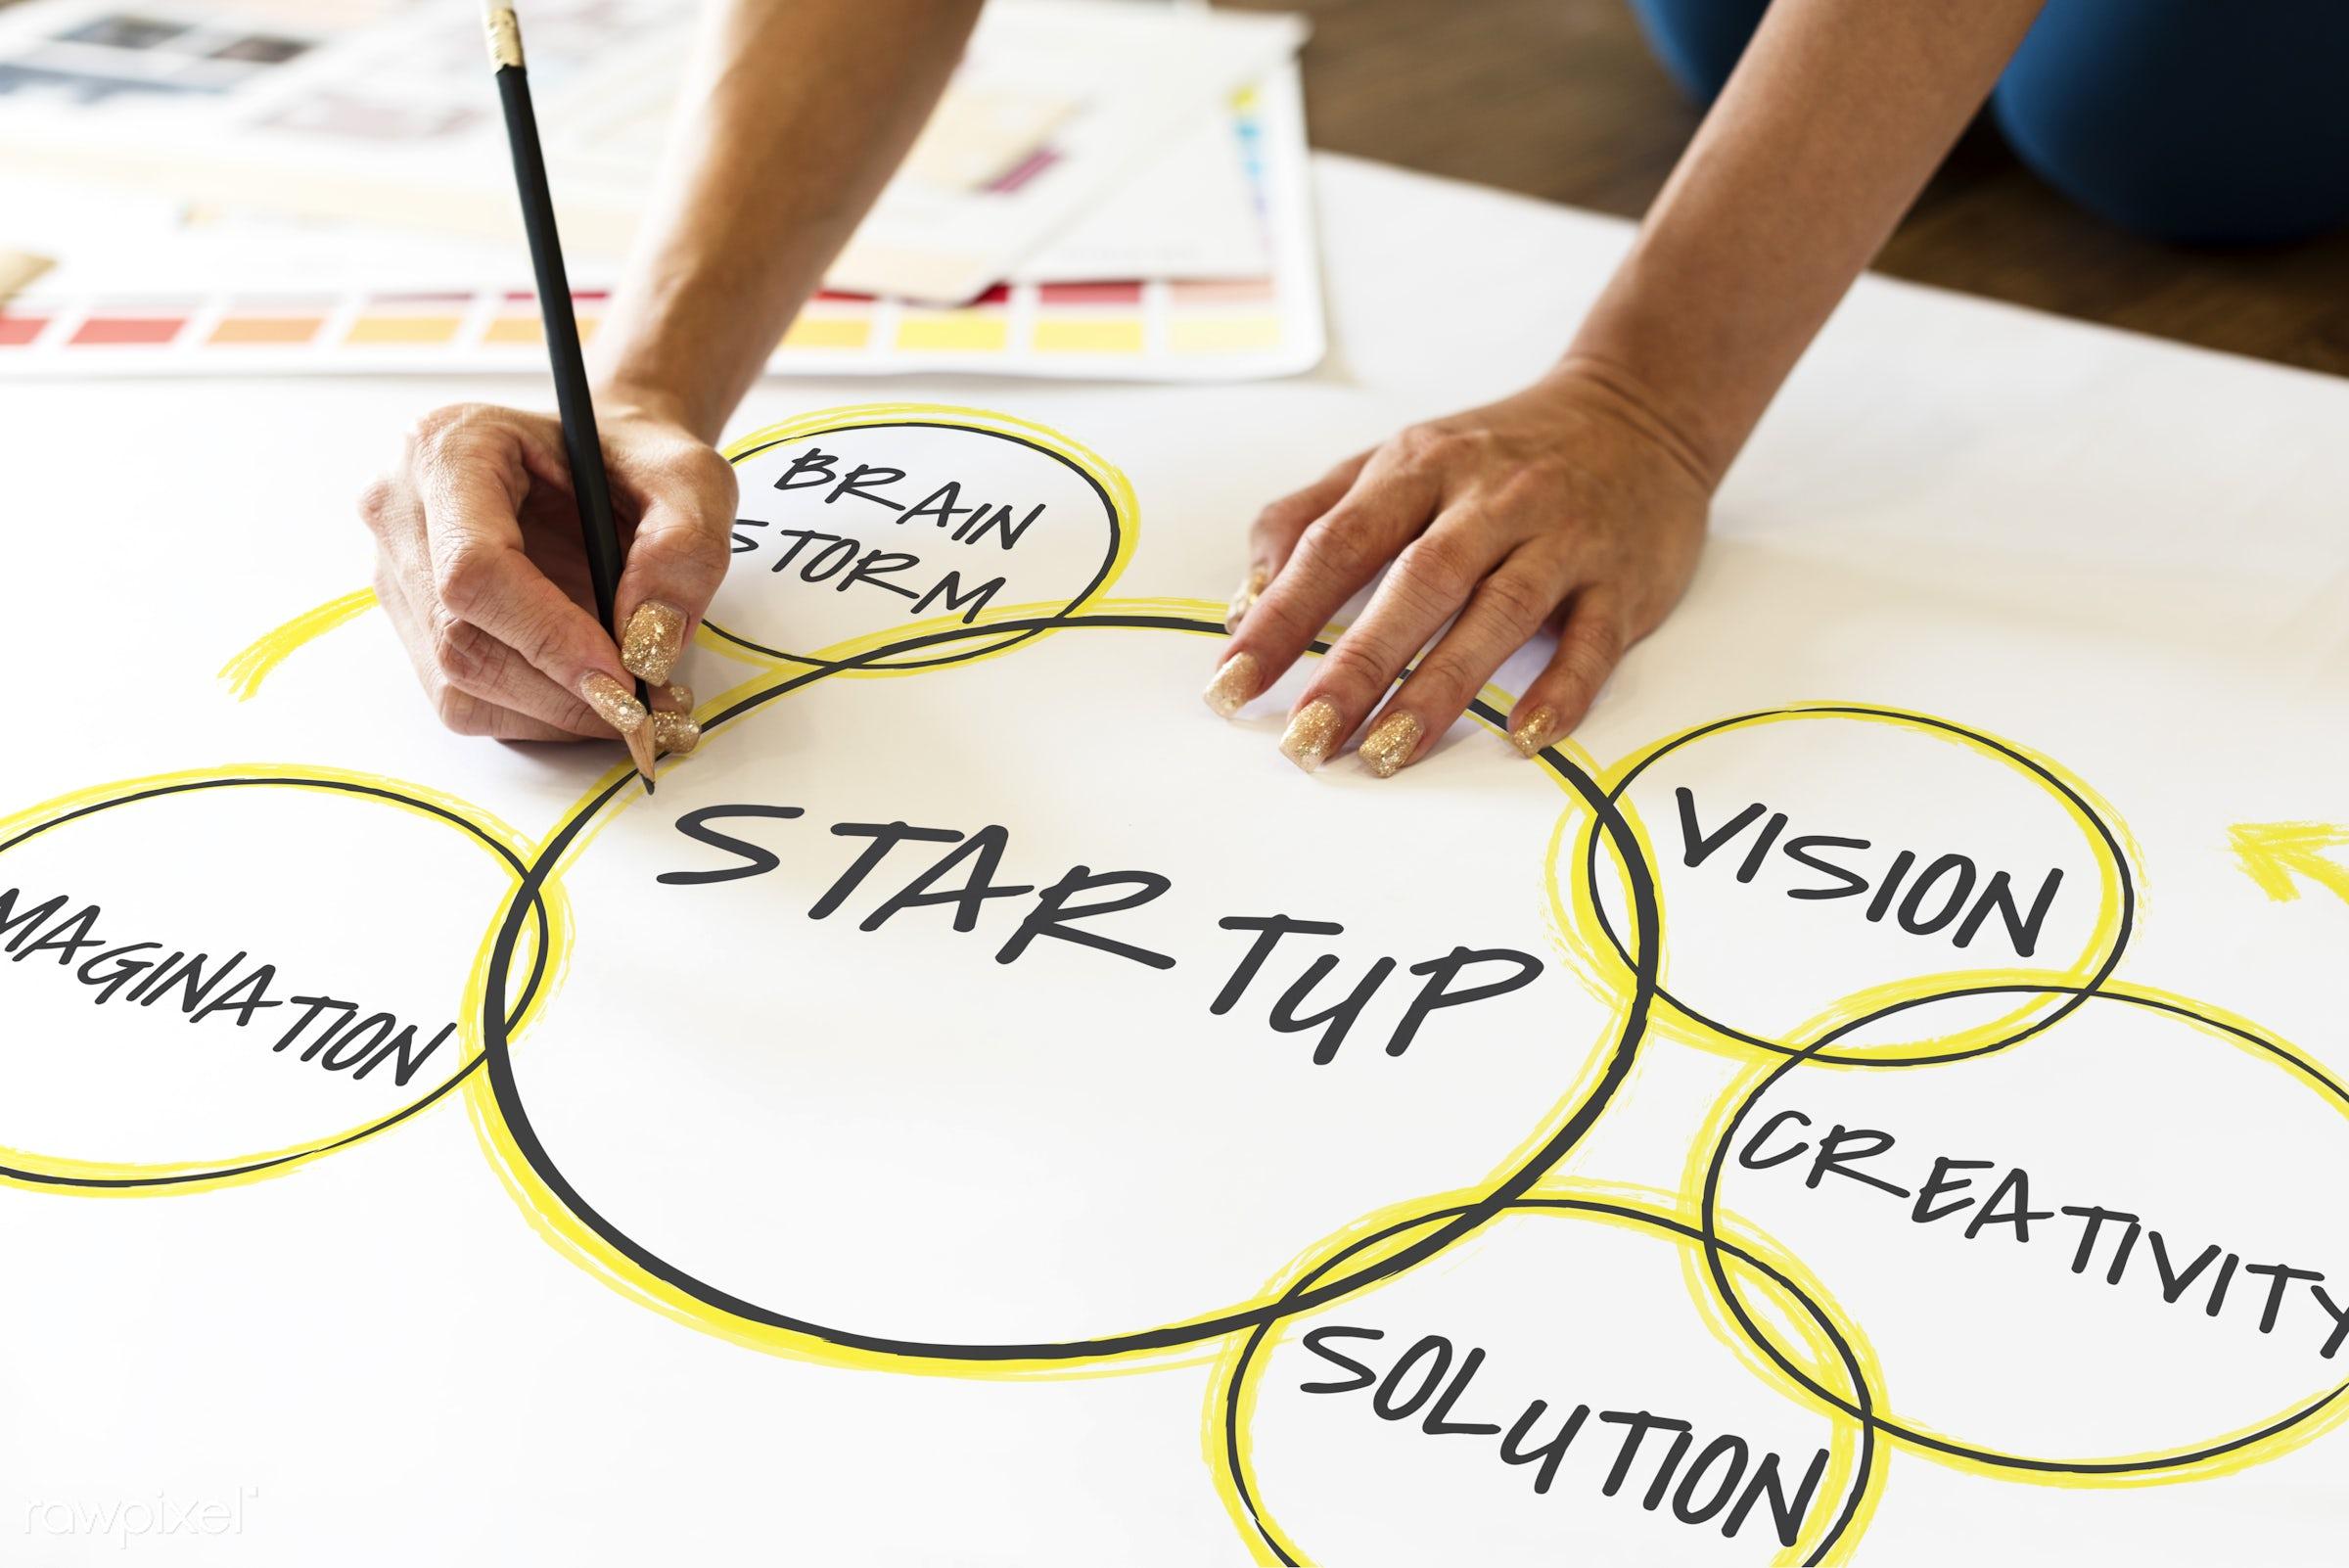 entrepreneurship, art, brainstorm, business, company, creation, creative, creativity, design, development, diagram, drawing...